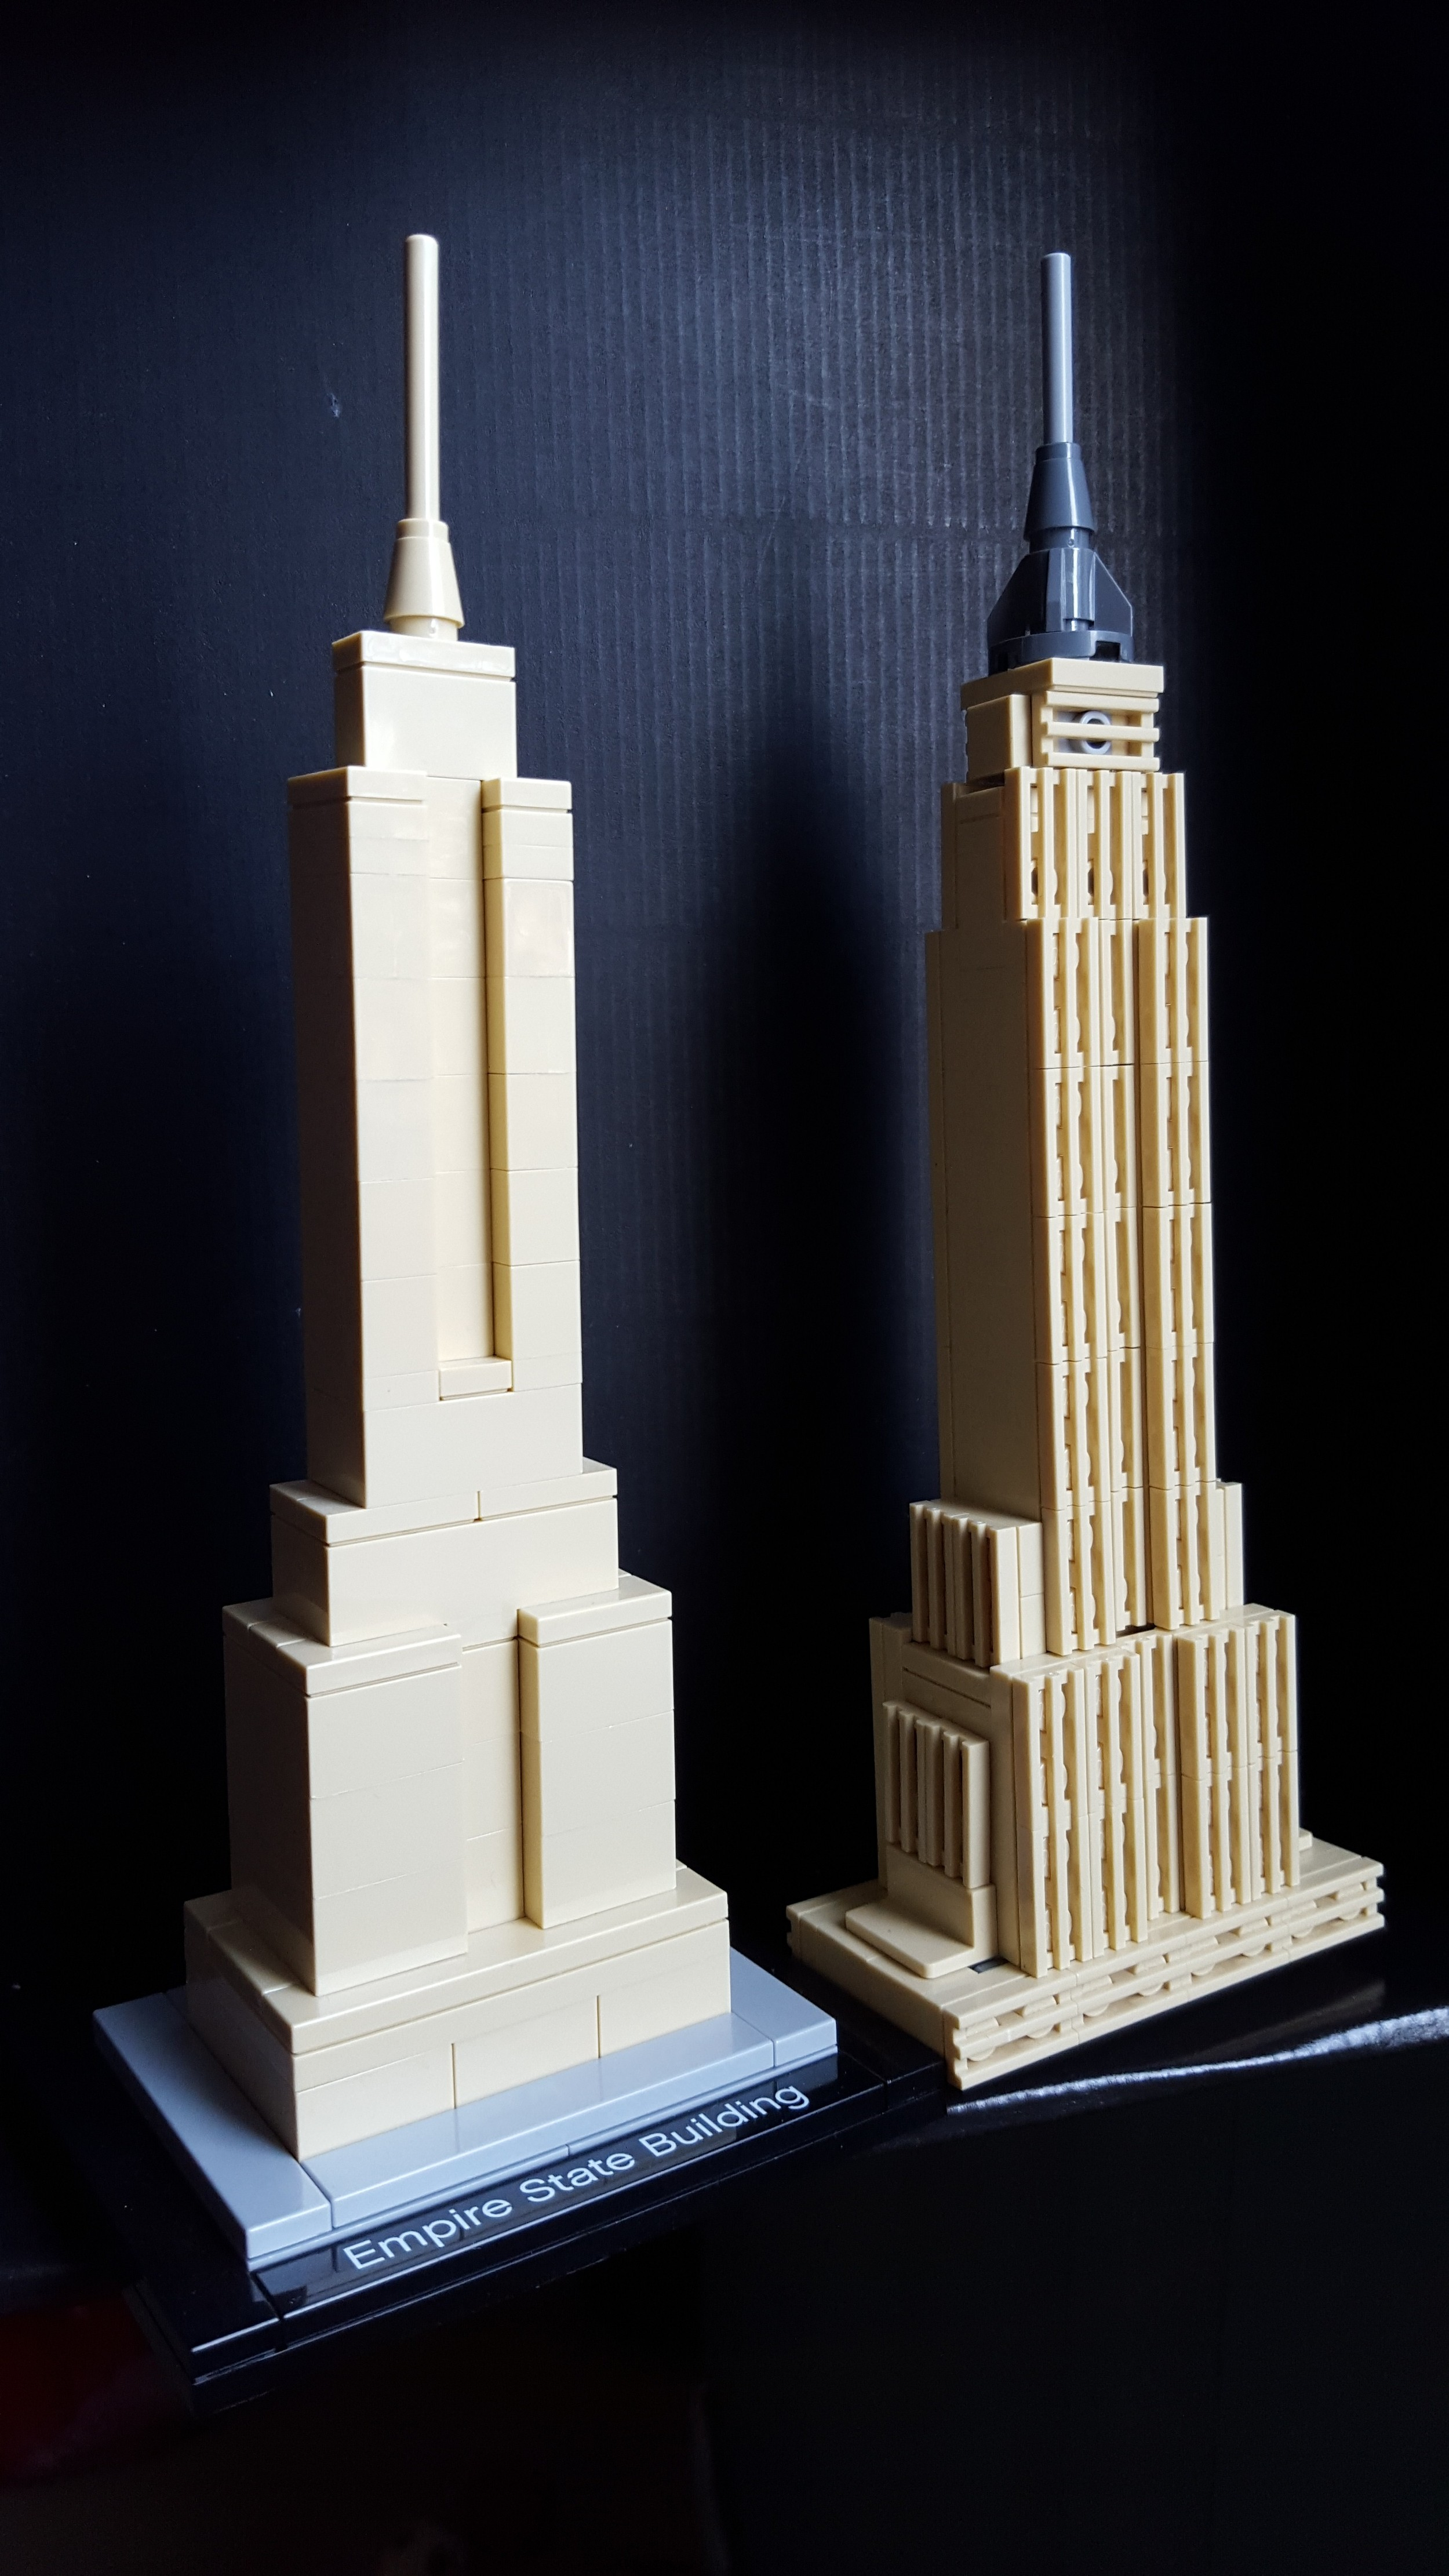 EVOLUTION, LEGO STYLE.